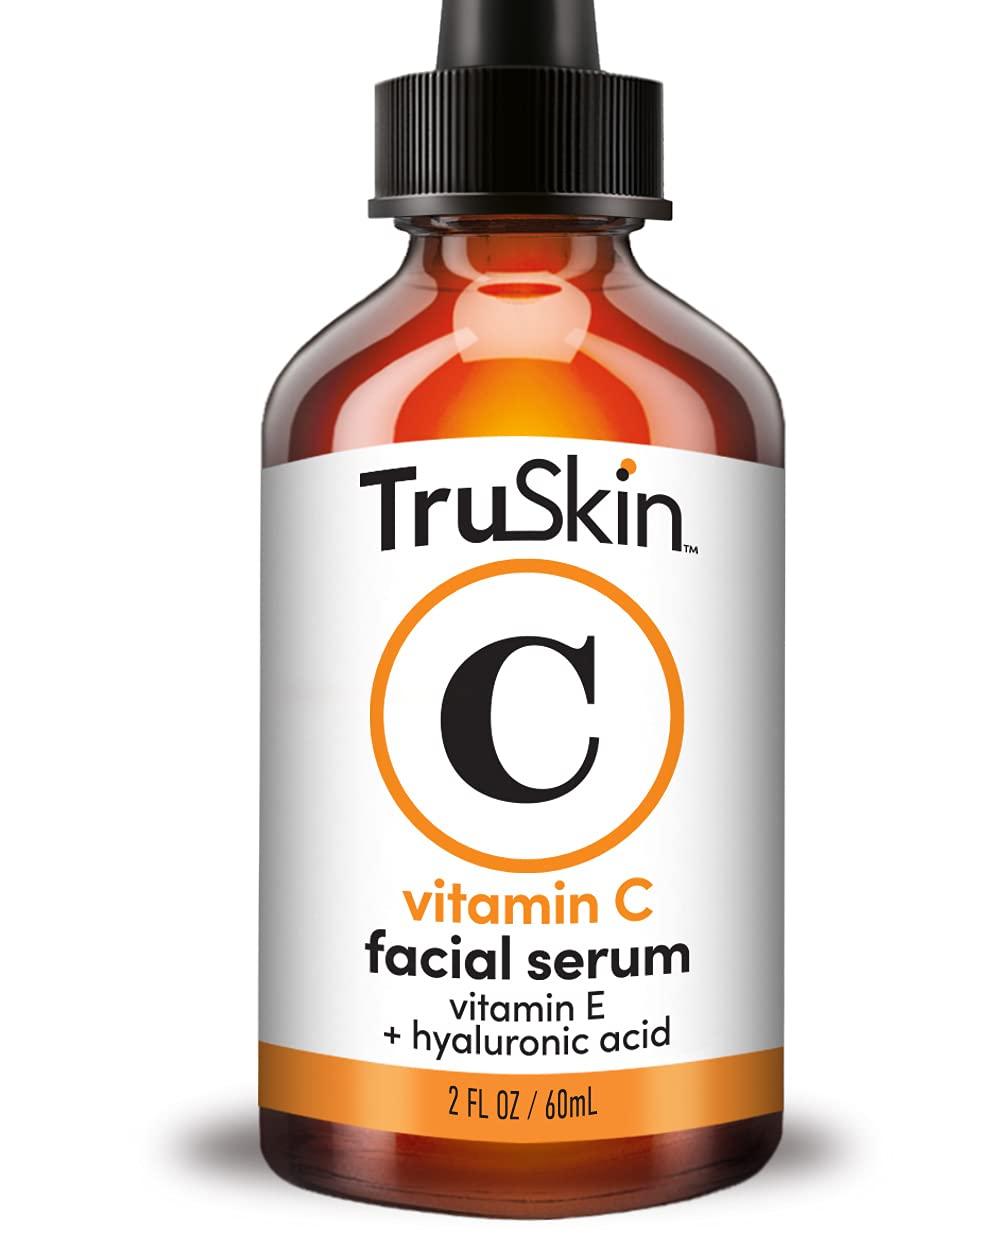 TruSkin Vitamin C Serum for Face [BIG 2-OZ Bottle] Topical Facial Serum...